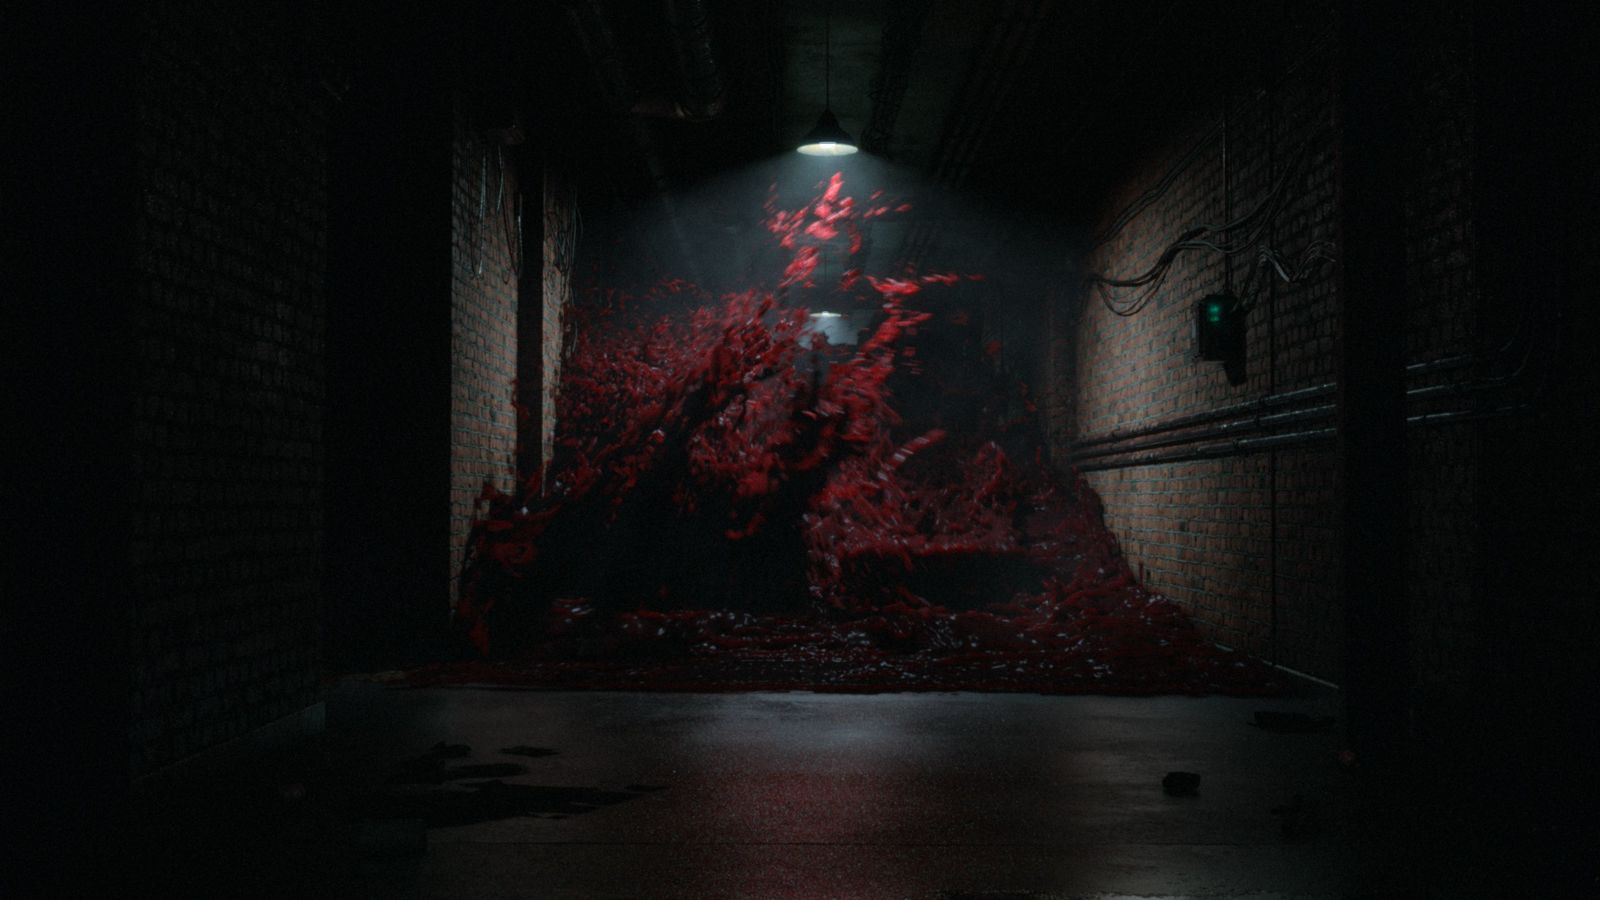 Platige Image Produces Trailer For Vampire The Masquerade